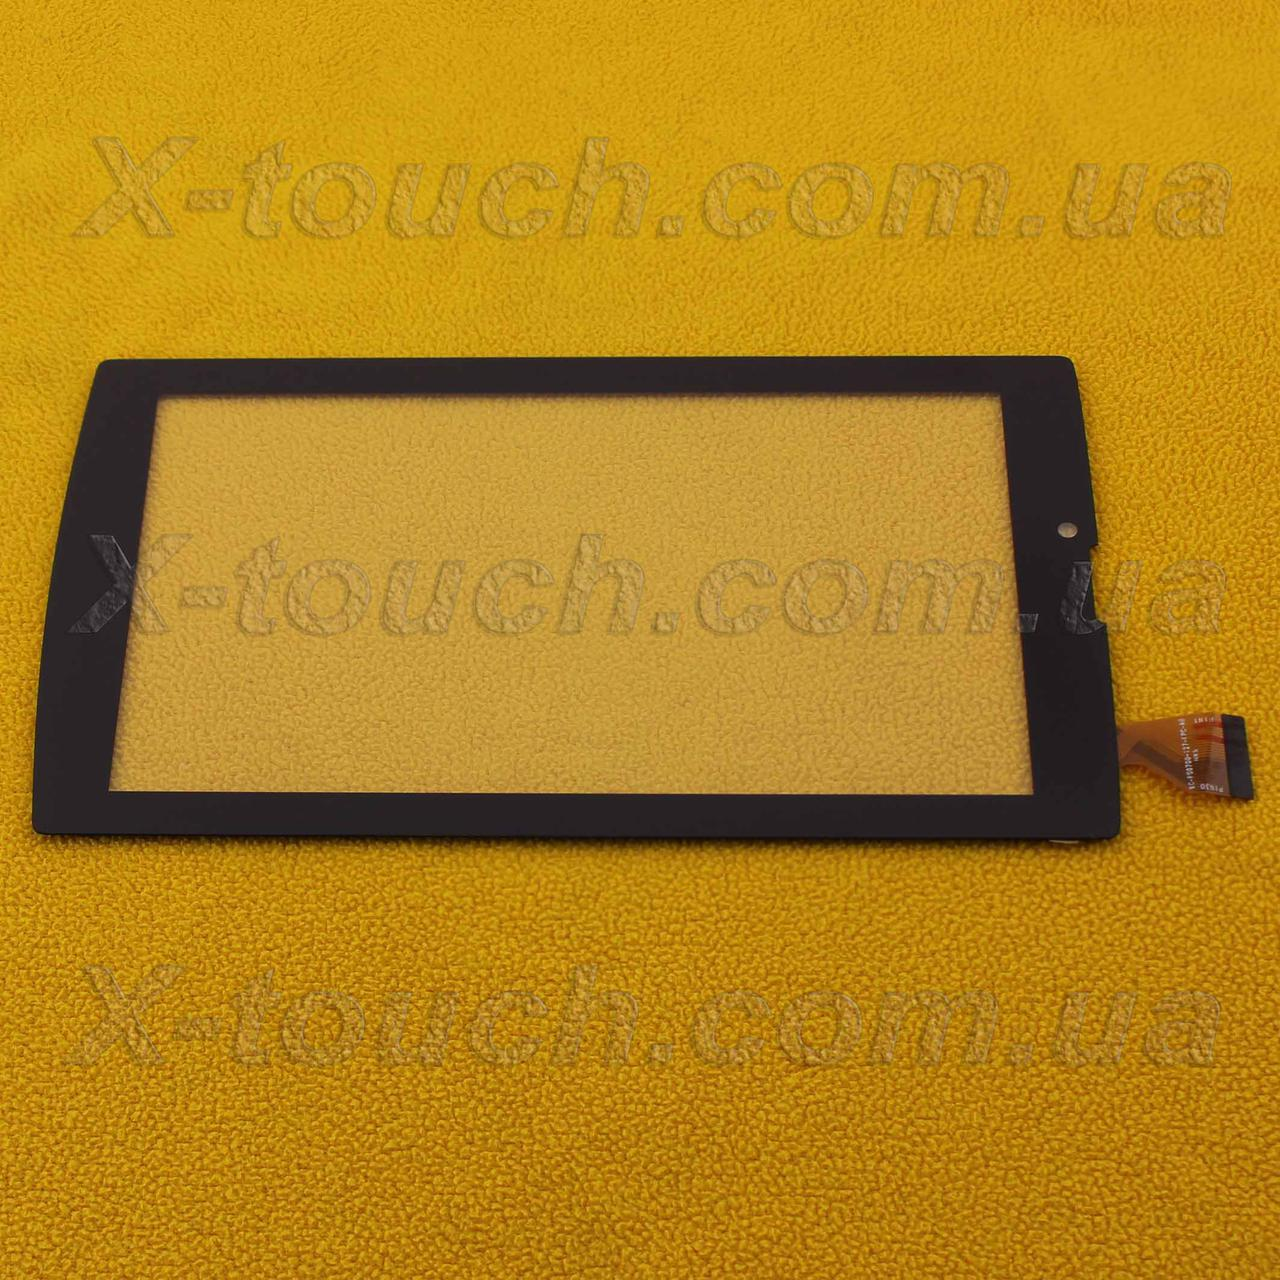 Cенсор, тачскрин FPC-DP070002A01-F0 для планшета. Вид 2